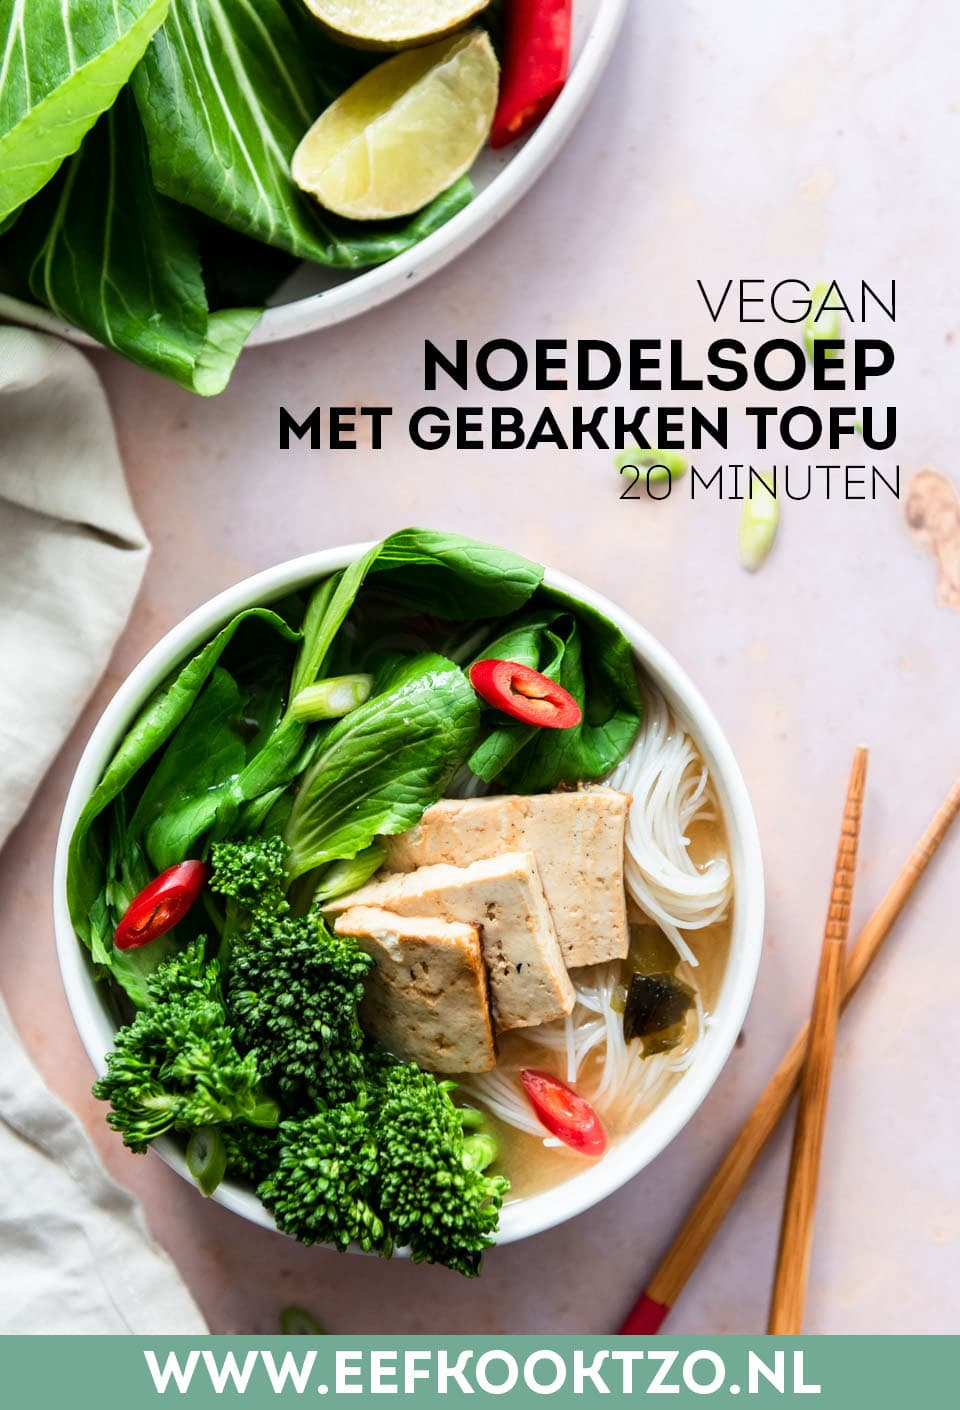 Vegan noedelsoep Pinterest Collage